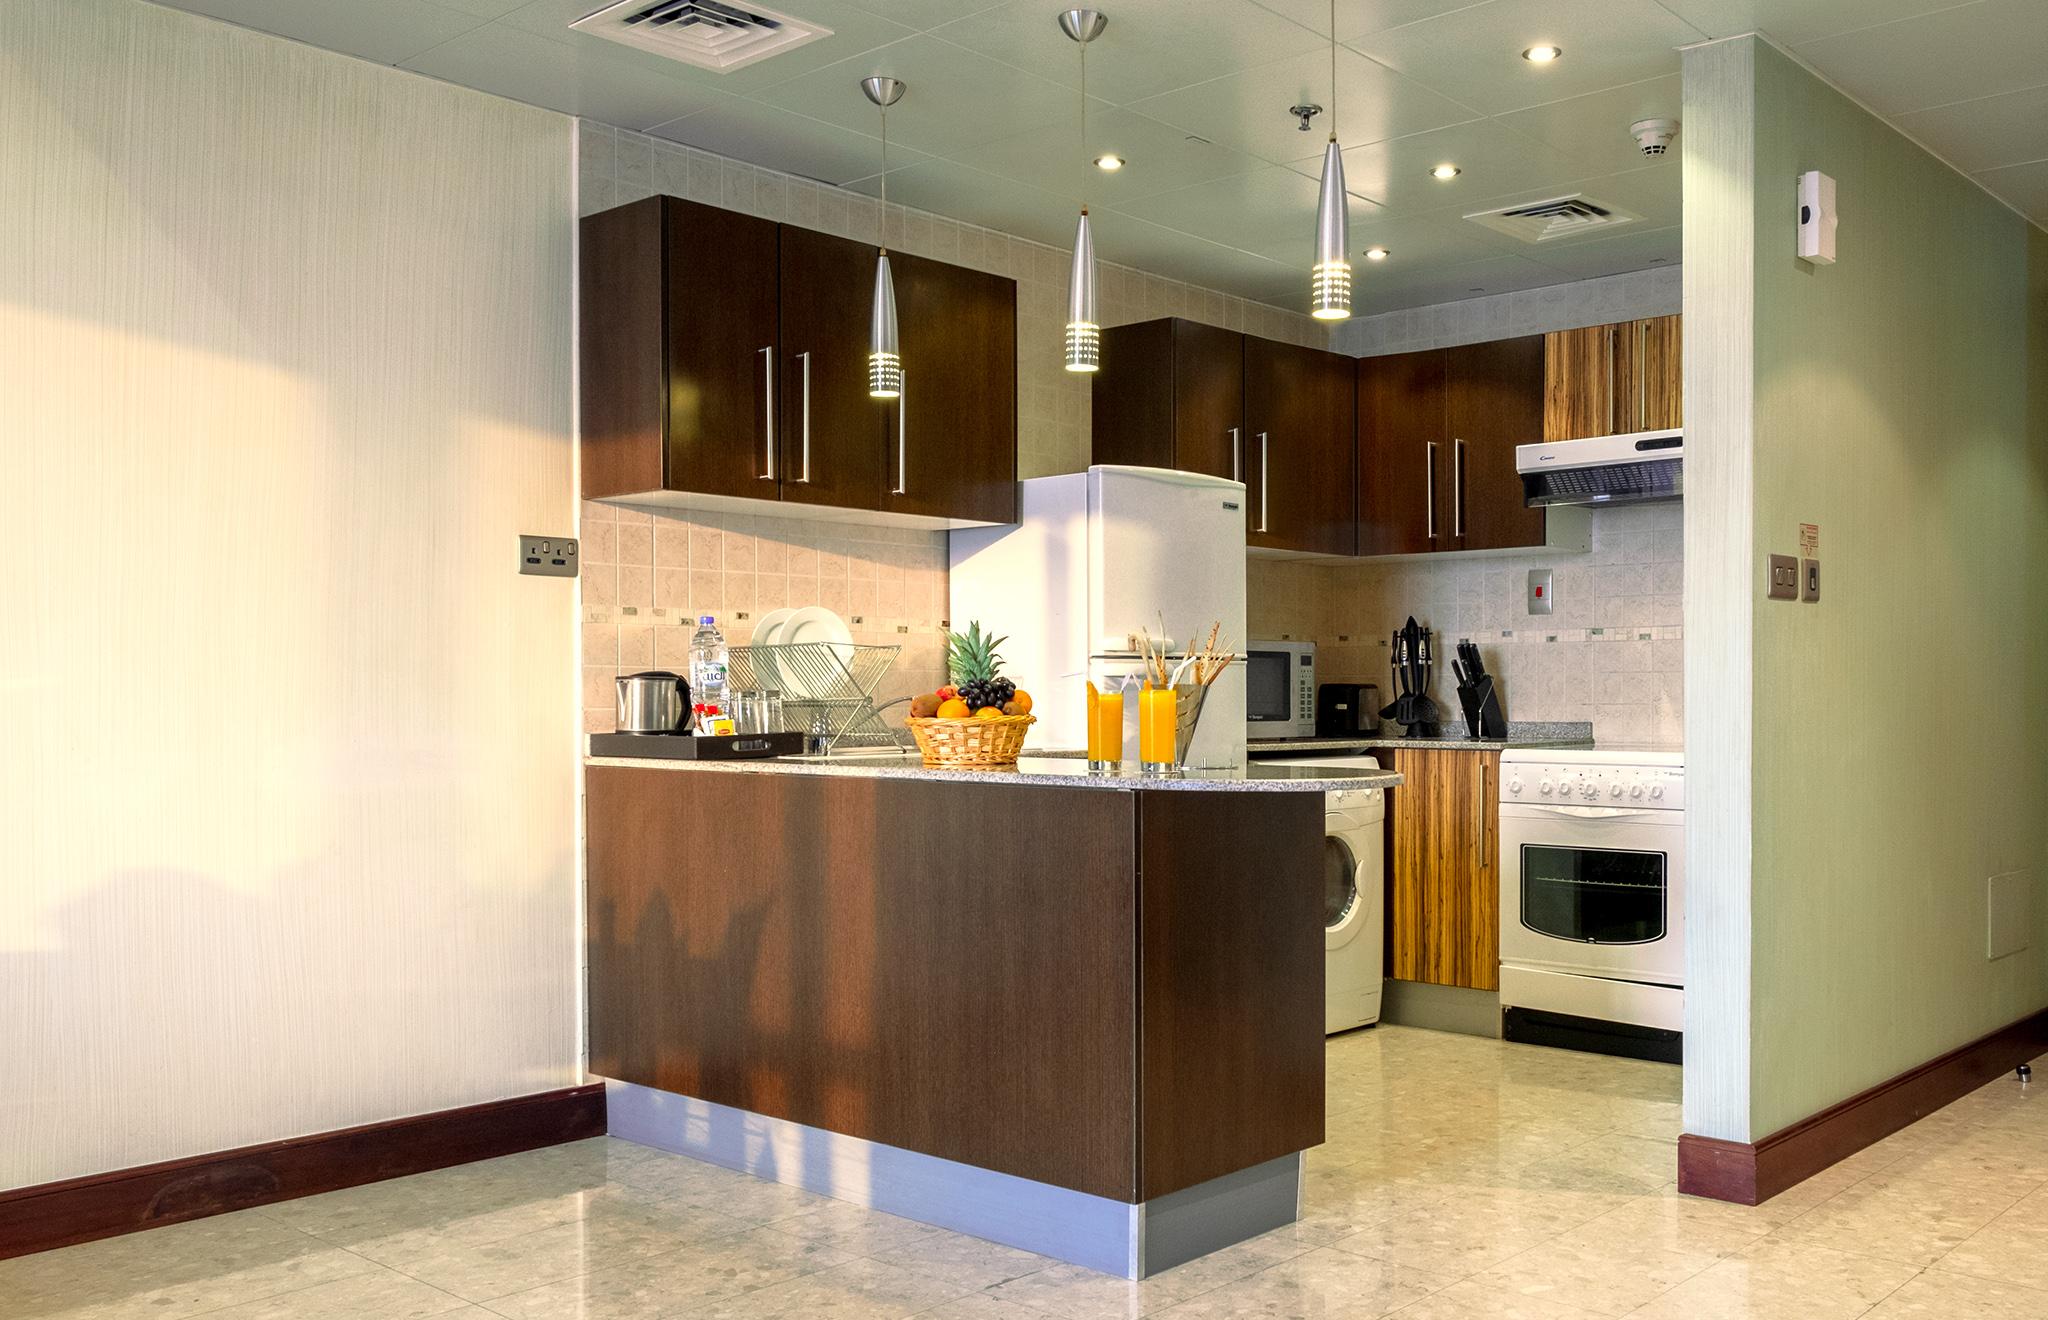 Image CPHA_1BR_Deluxe_Kitchen.jpg